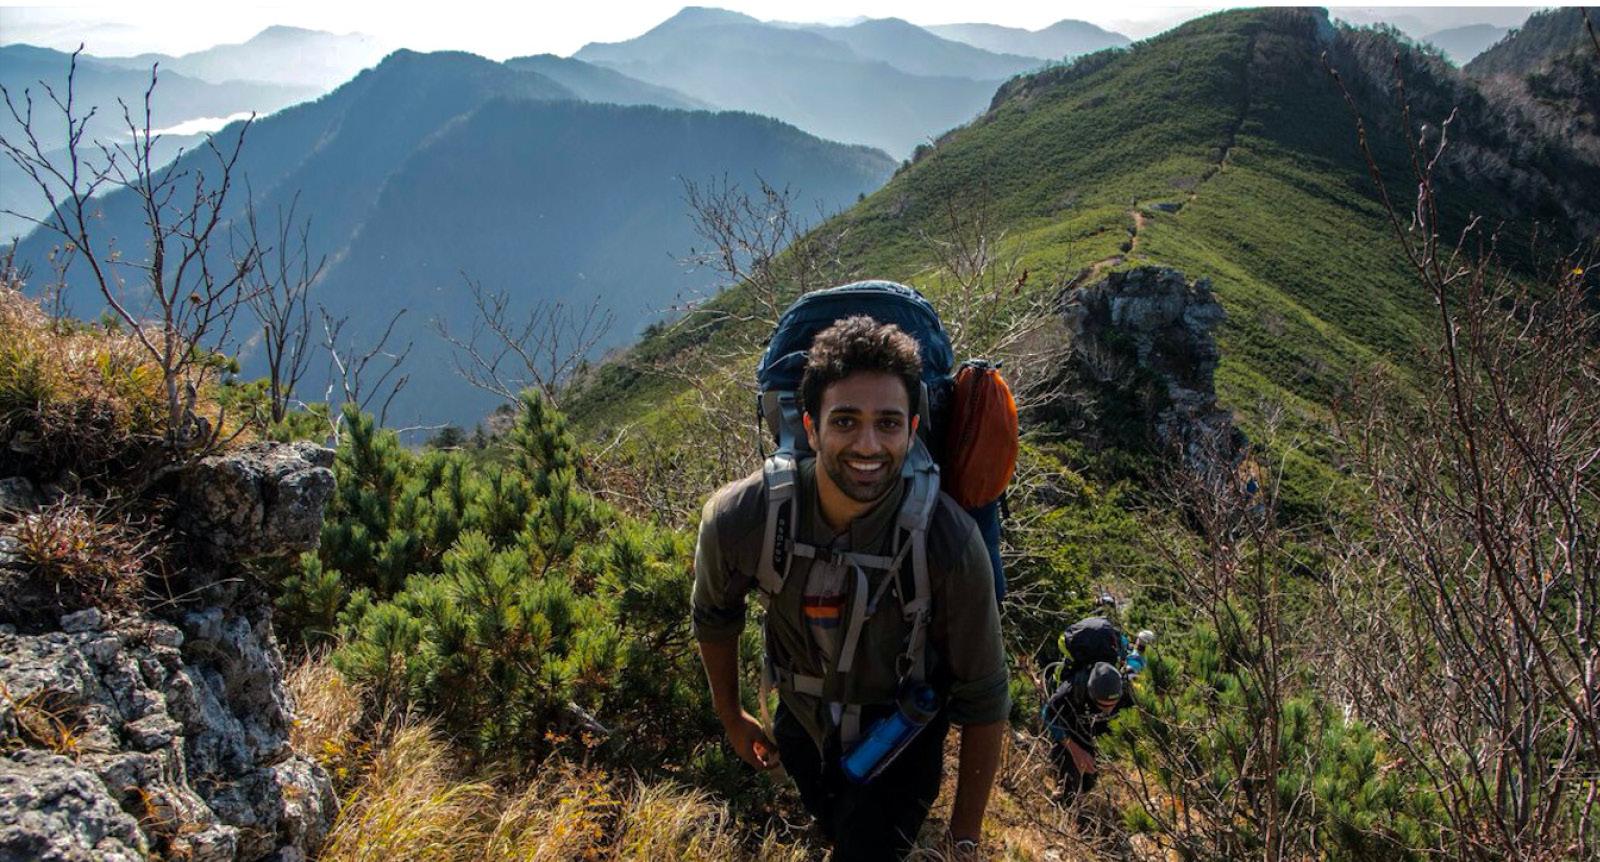 North Korean trek, team member smiles as he climbs up mount Myohyang